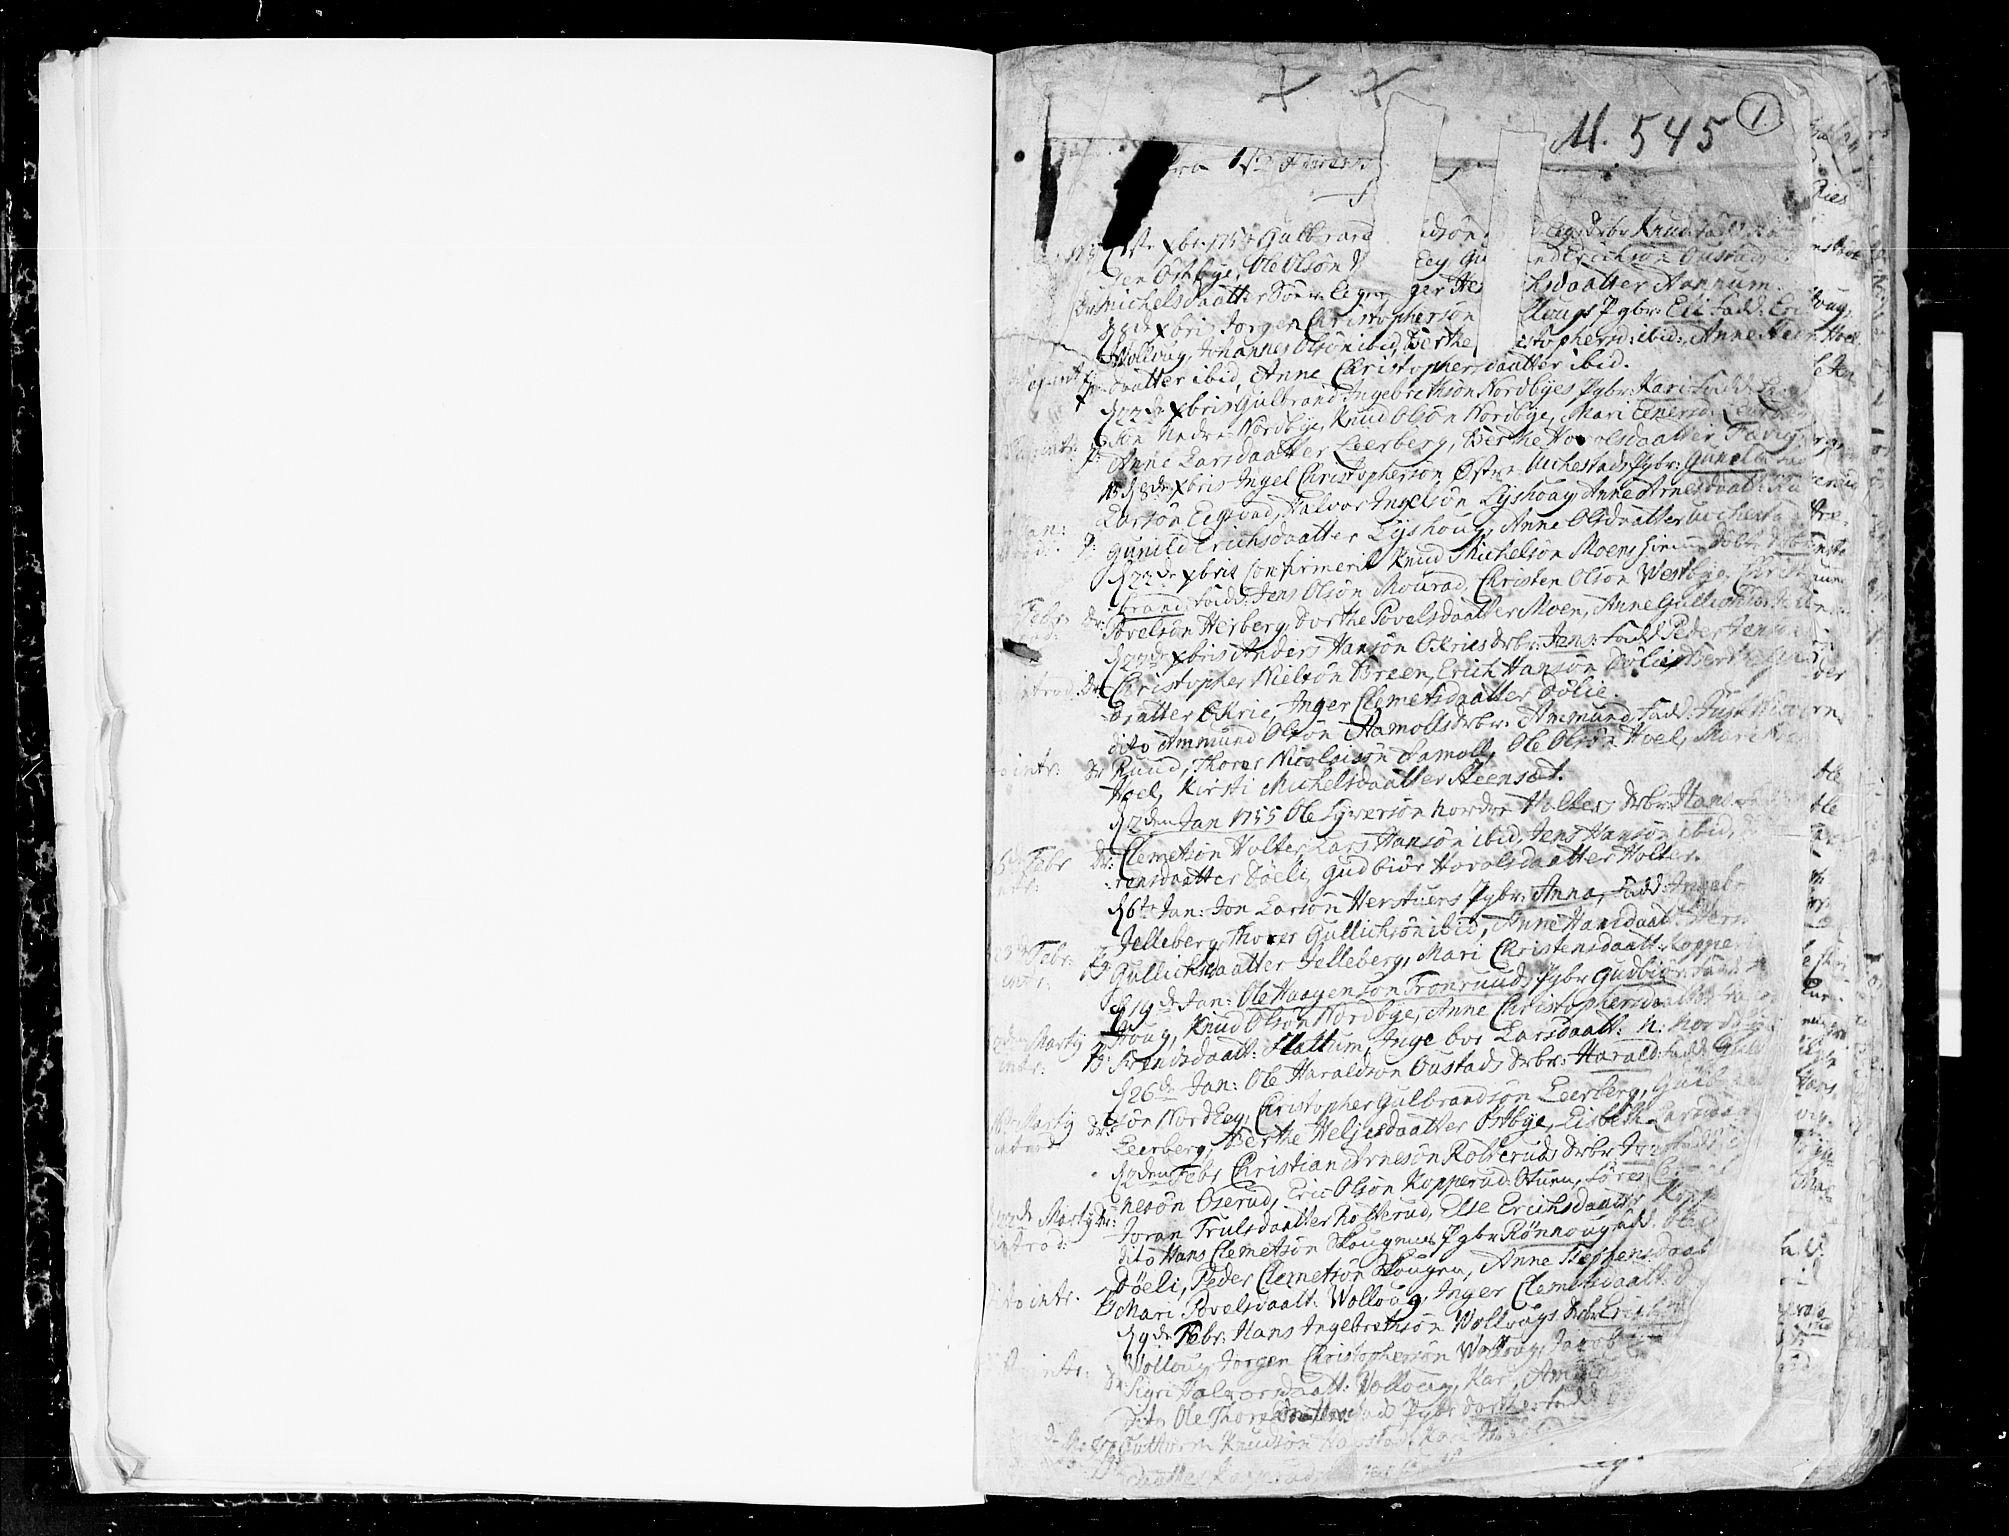 SAO, Nannestad prestekontor Kirkebøker, F/Fa/L0007: Ministerialbok nr. I 7, 1754-1791, s. 0-1